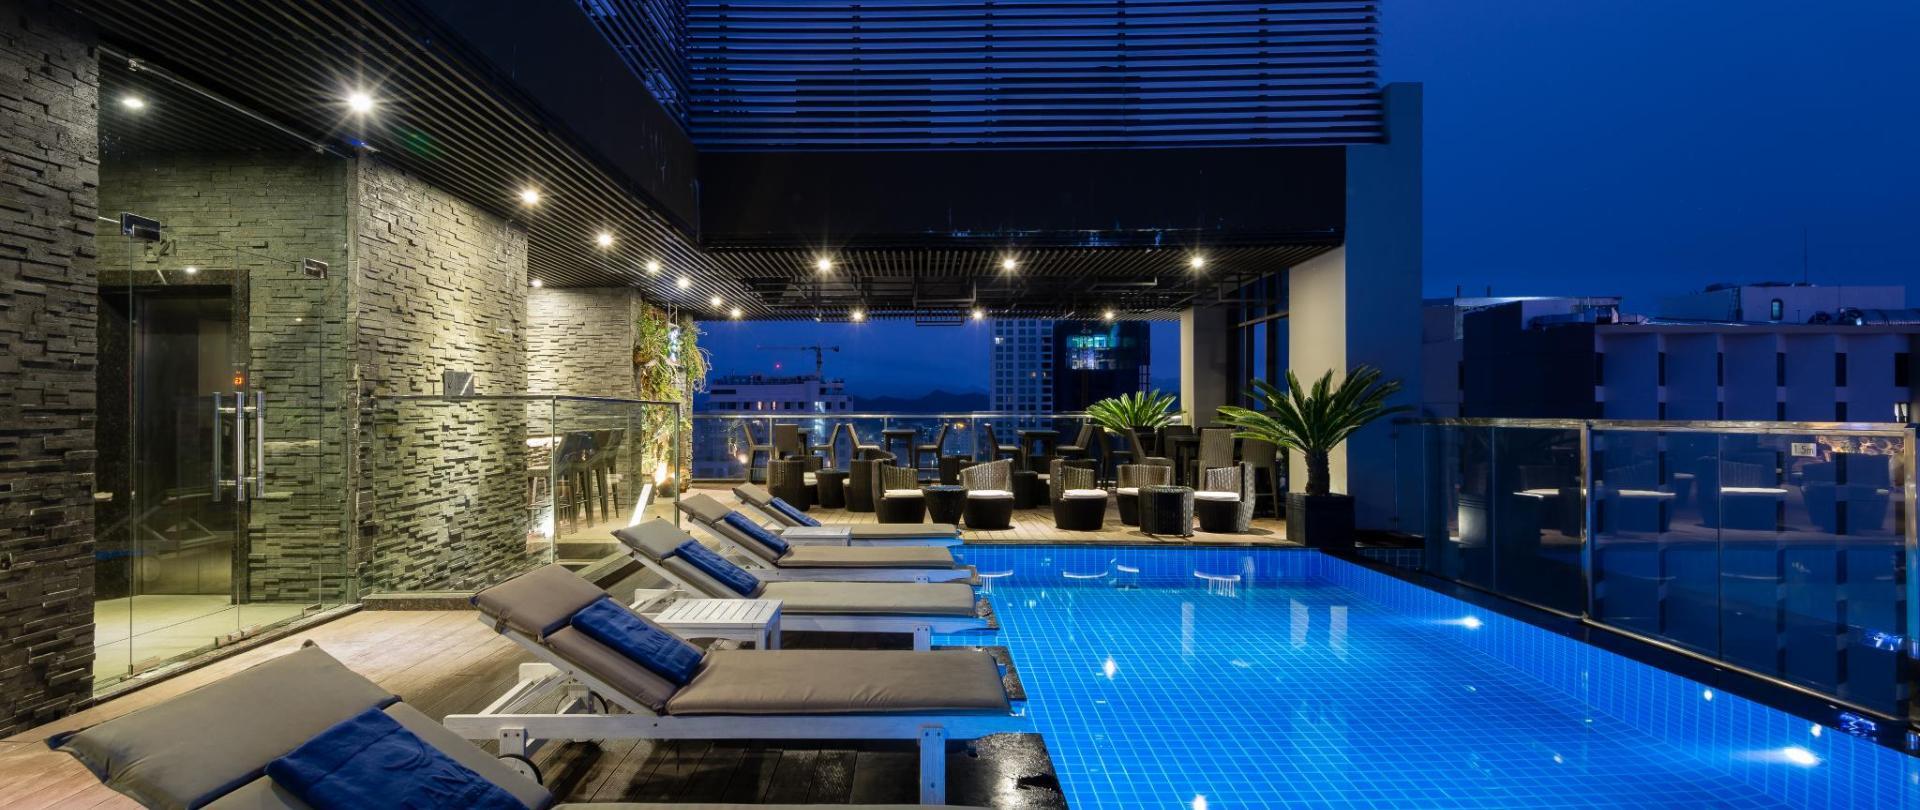 Outdoor Rooftop Swimming Pool (4).jpg